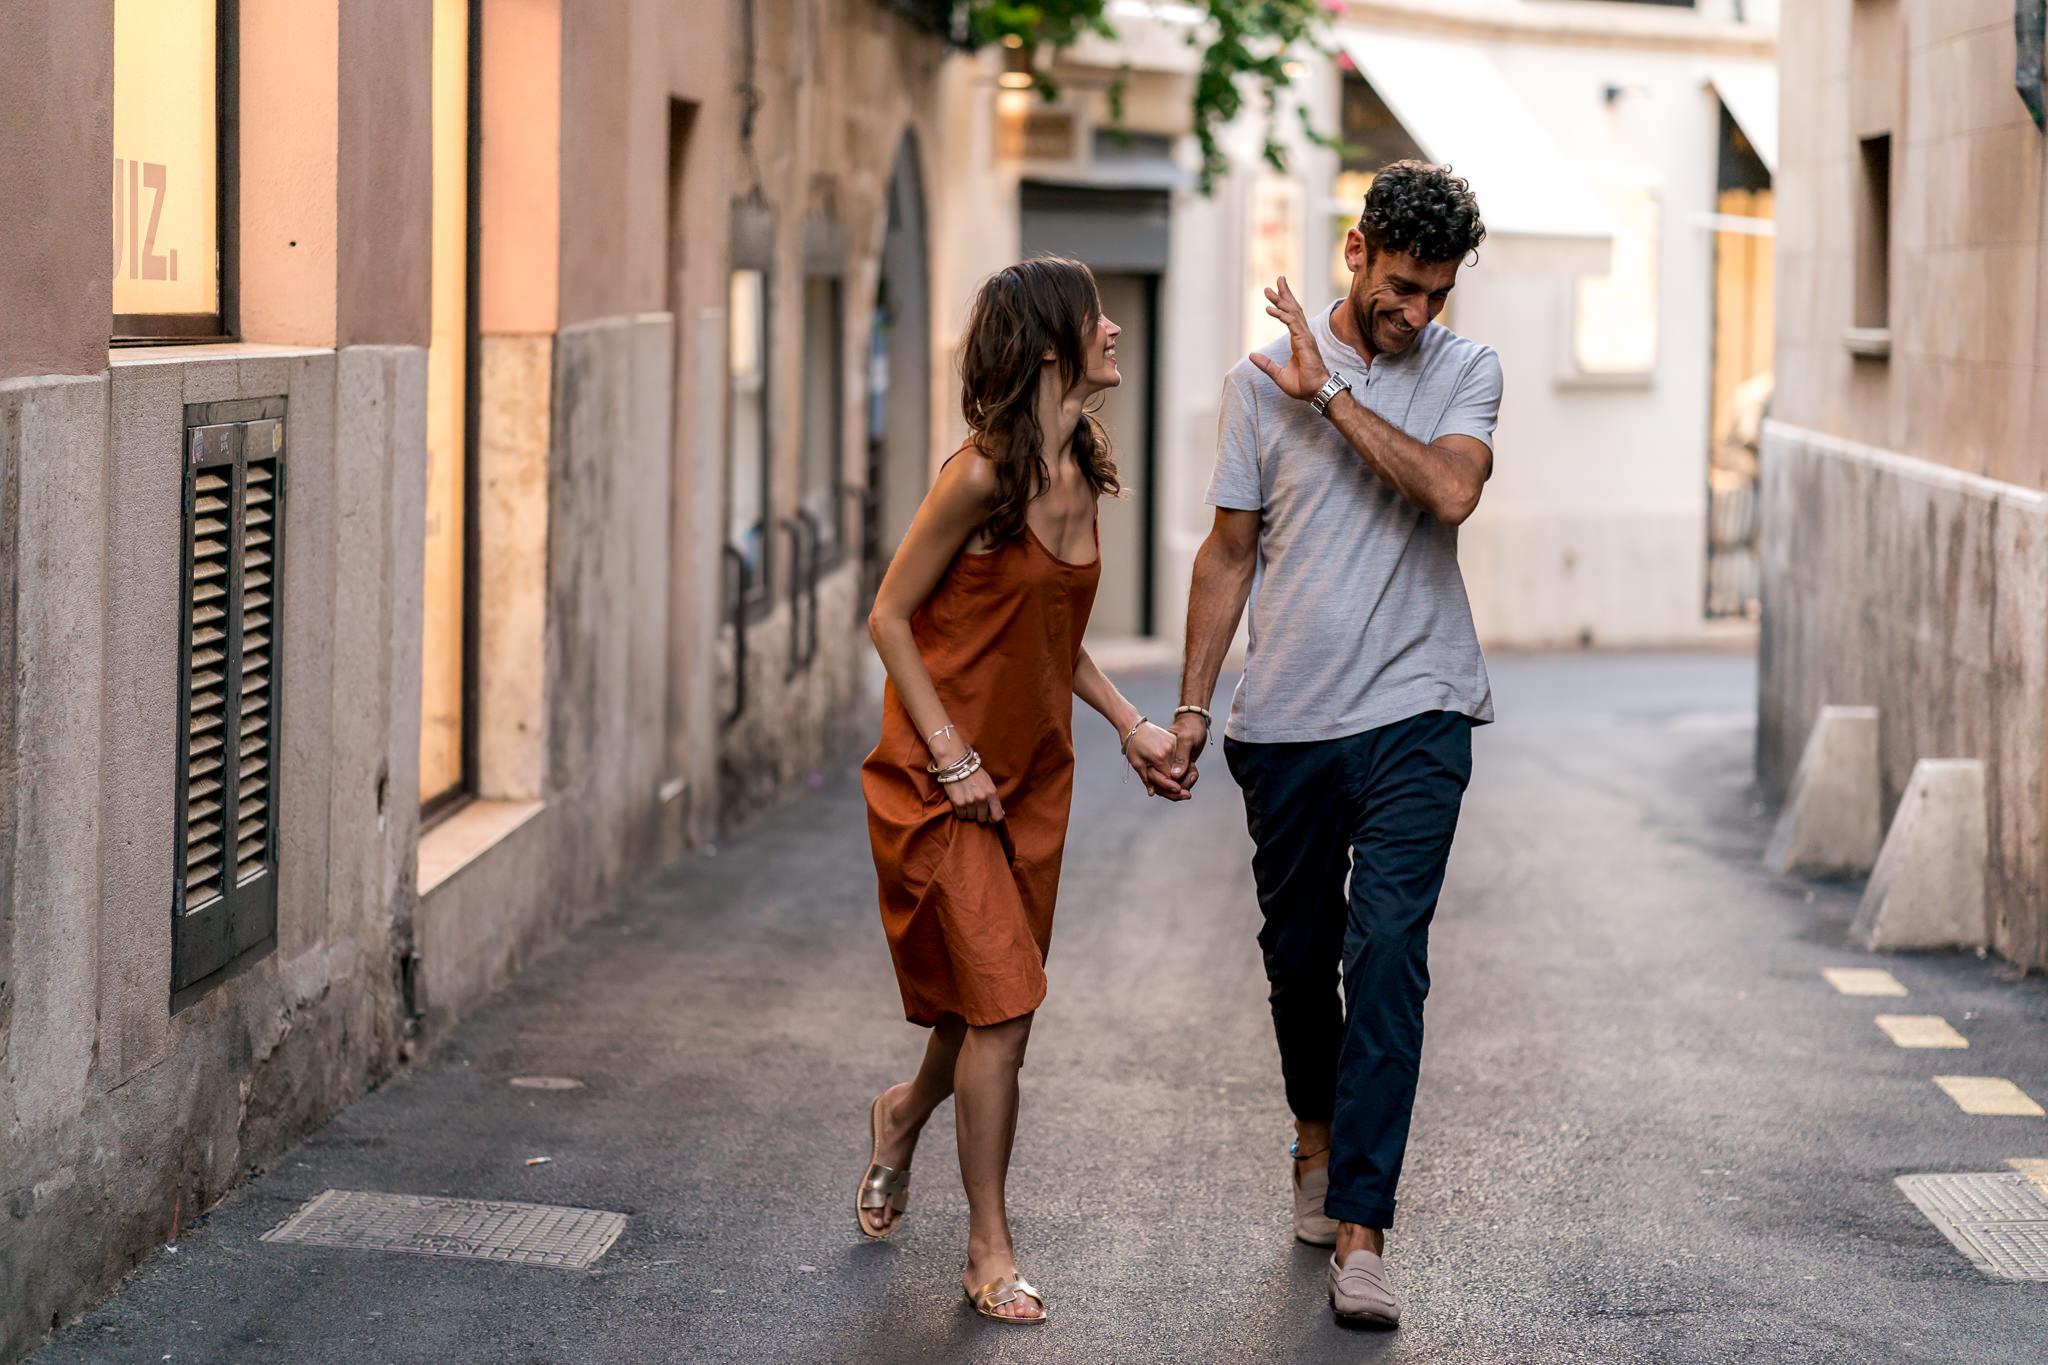 paseo por el casco antiguo de Palma